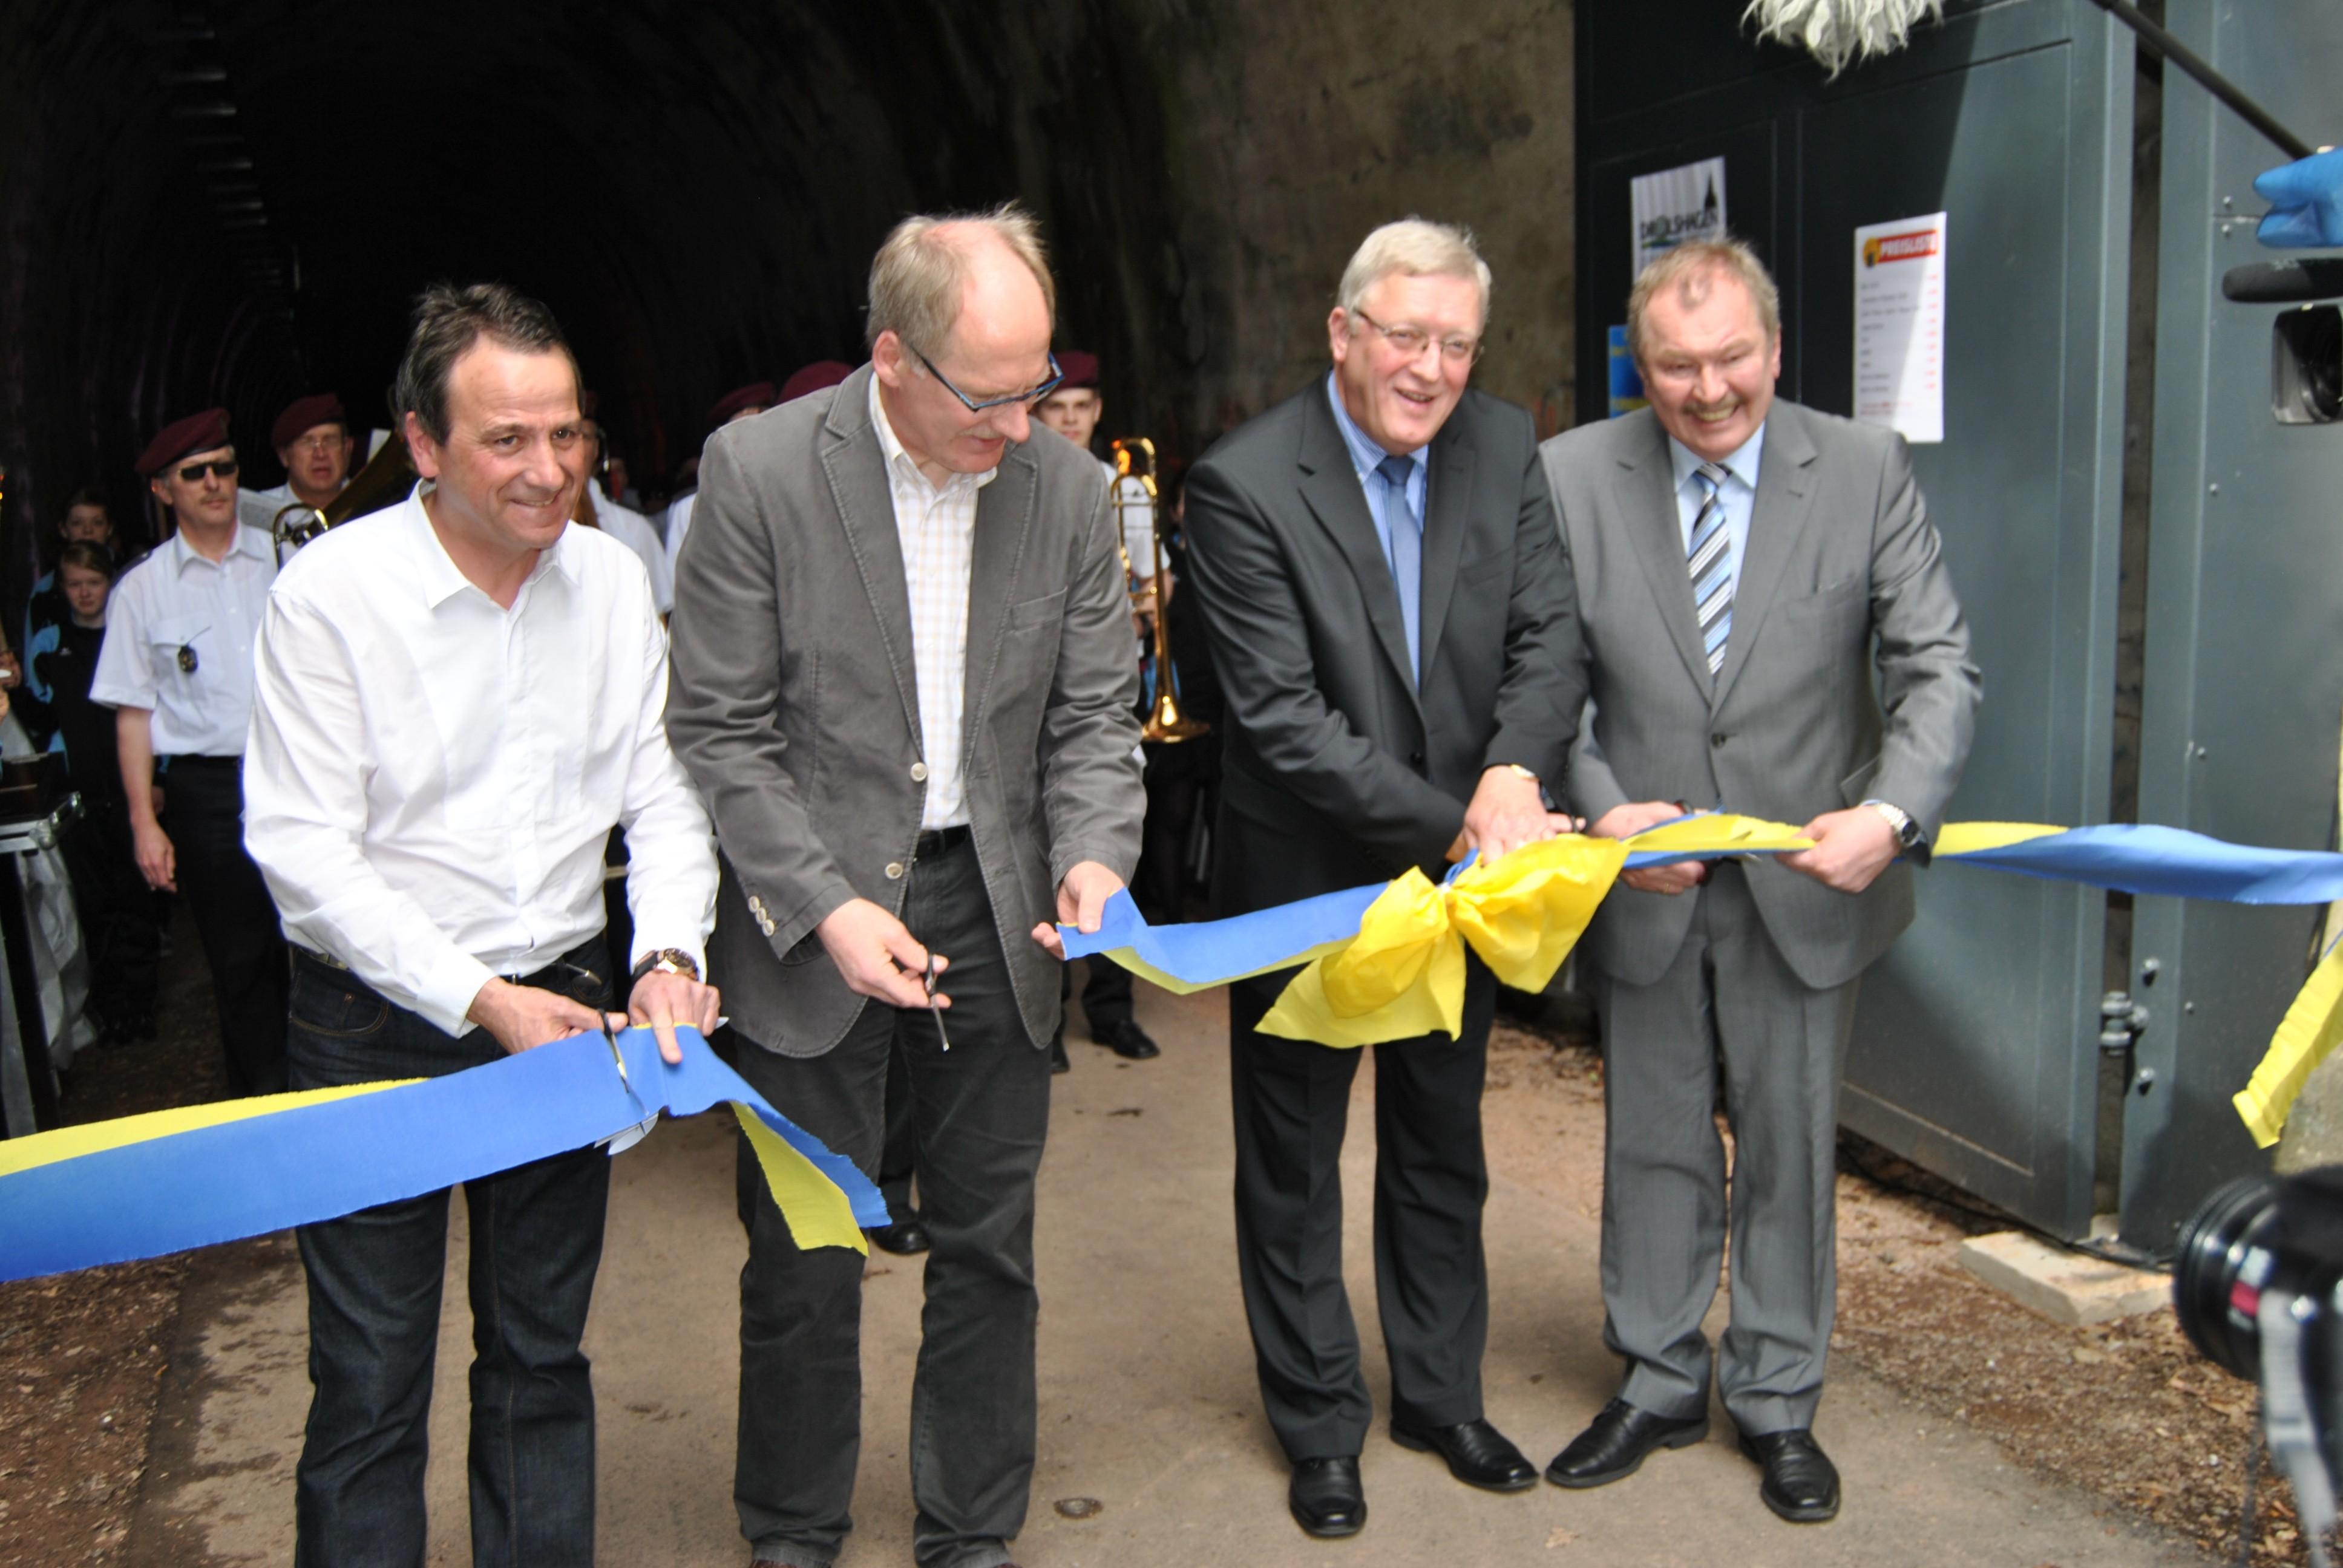 Photo of Drolshagen: Tunnelfest am neuen Fahrradtunnel (Fotostrecke)